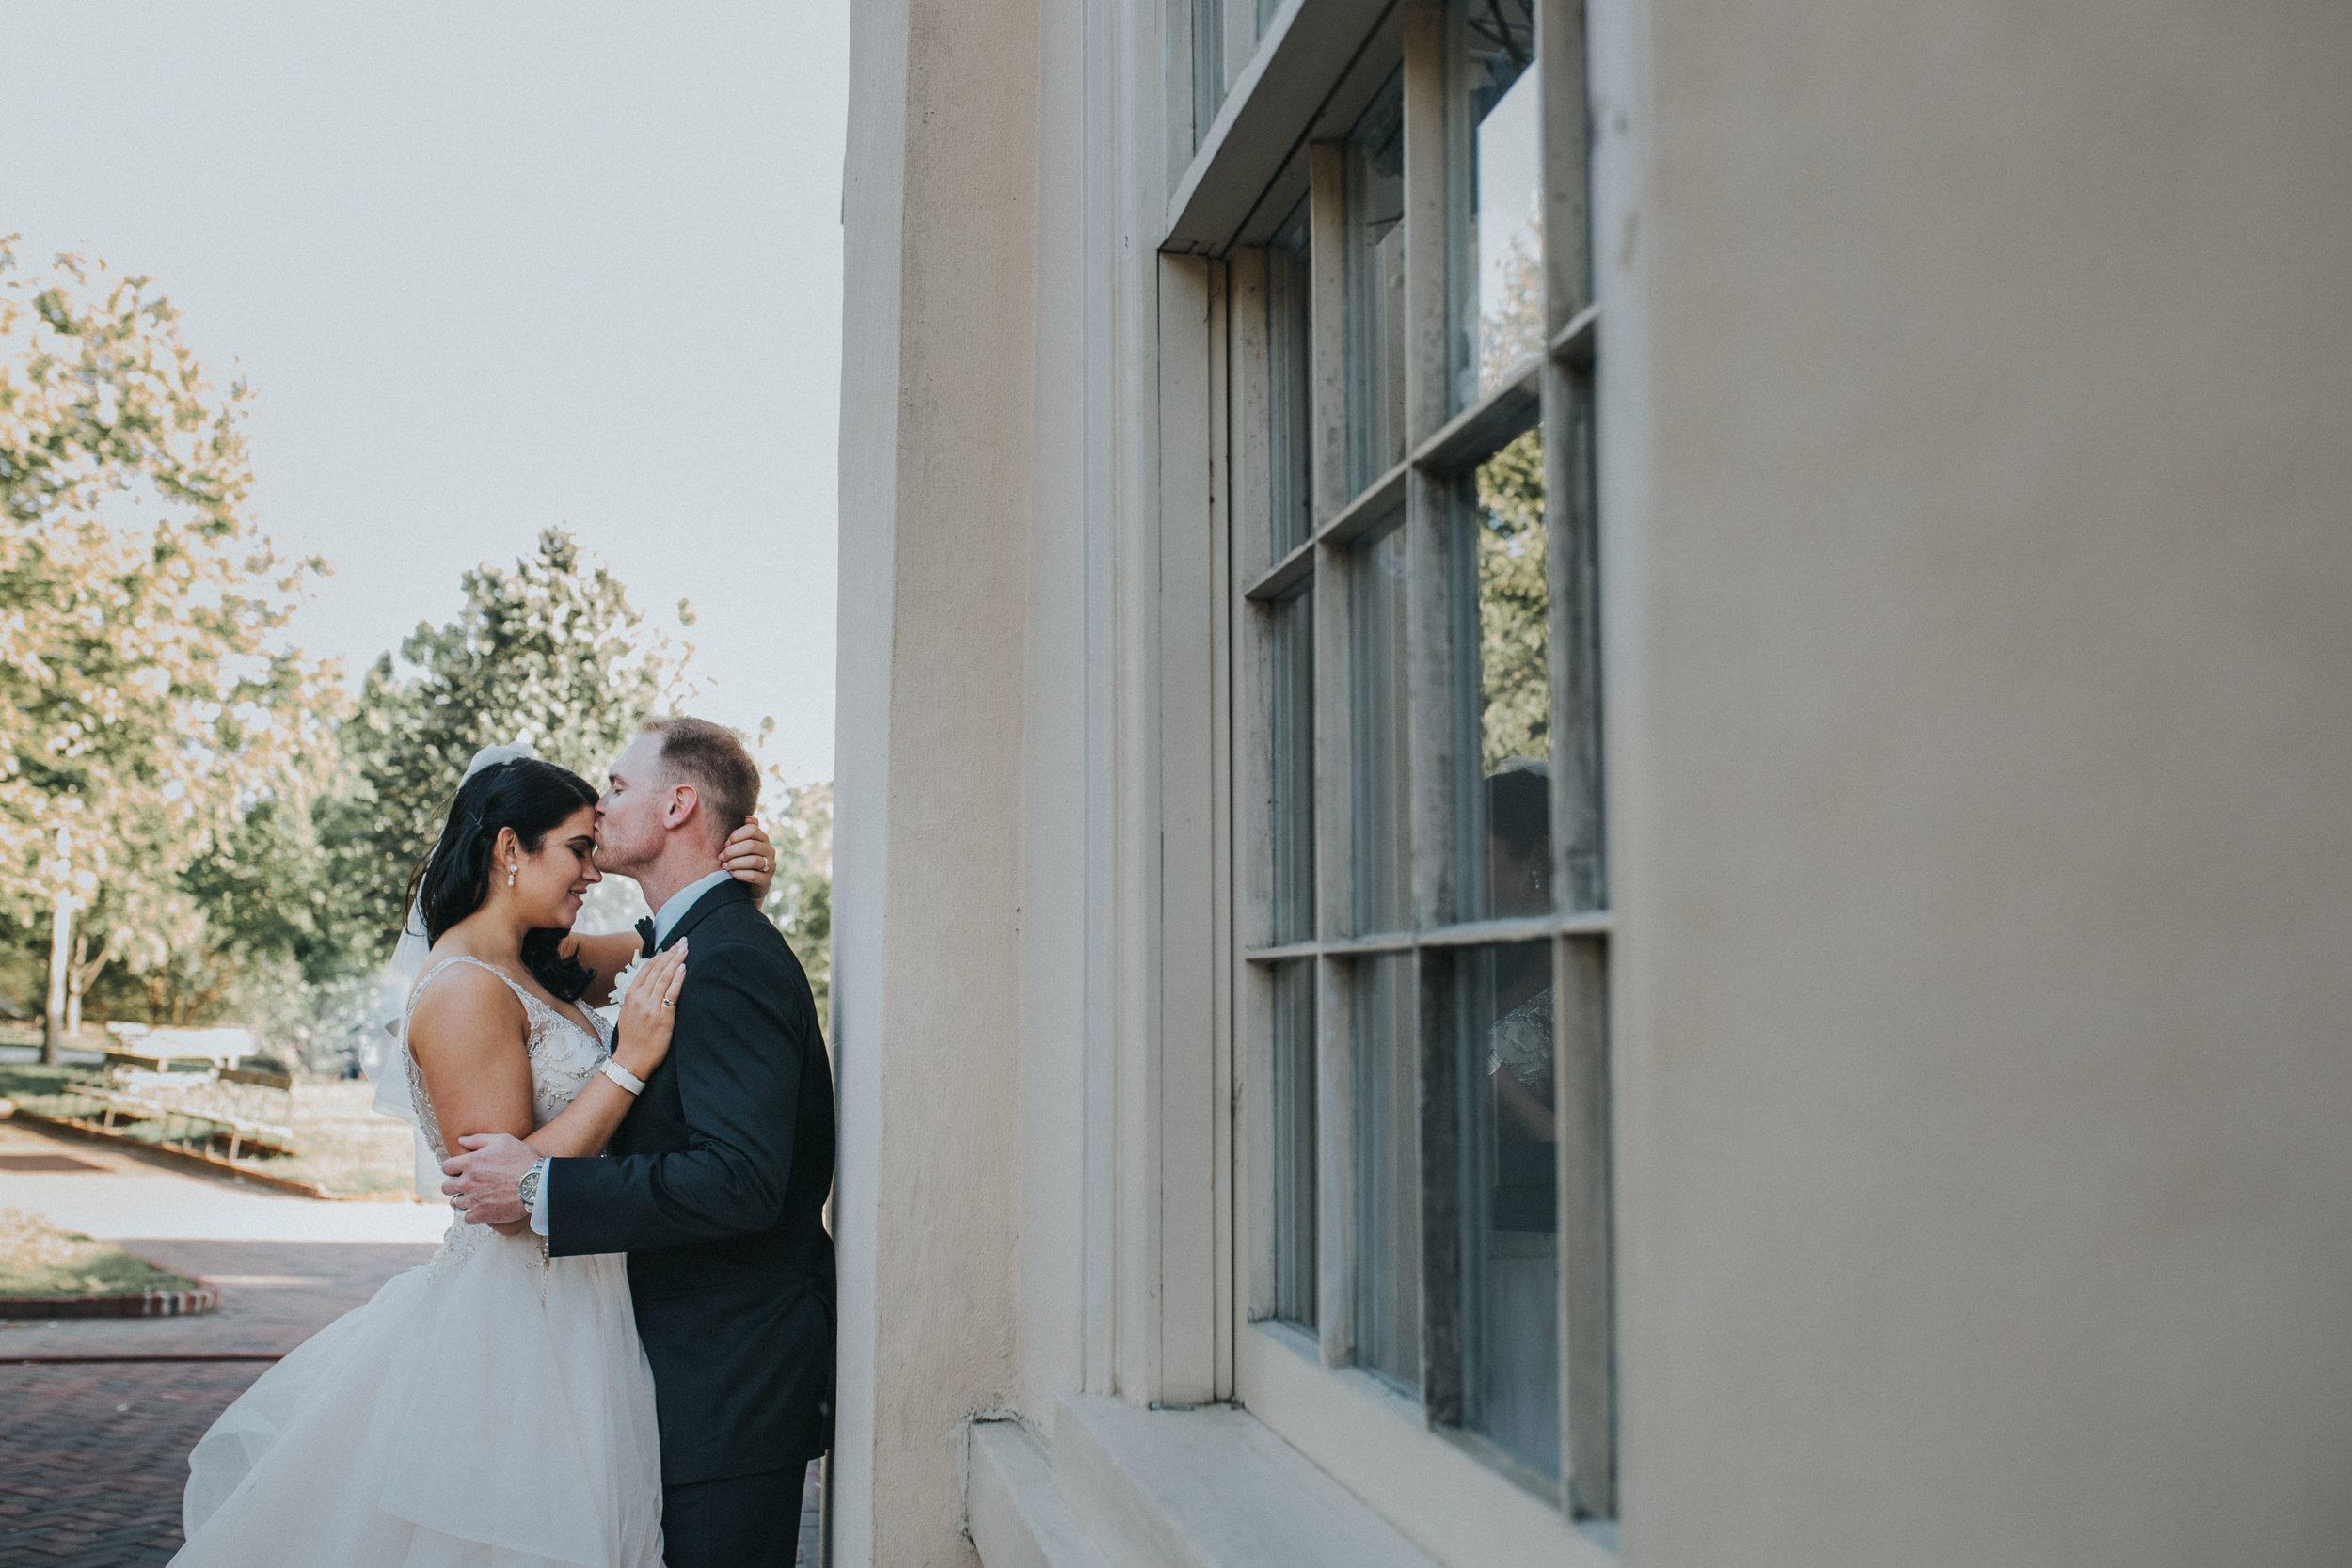 NewJersey_Wedding_Photography_Philadelphia__cescaphe_Waterworks_Bride&Groom-24.jpg